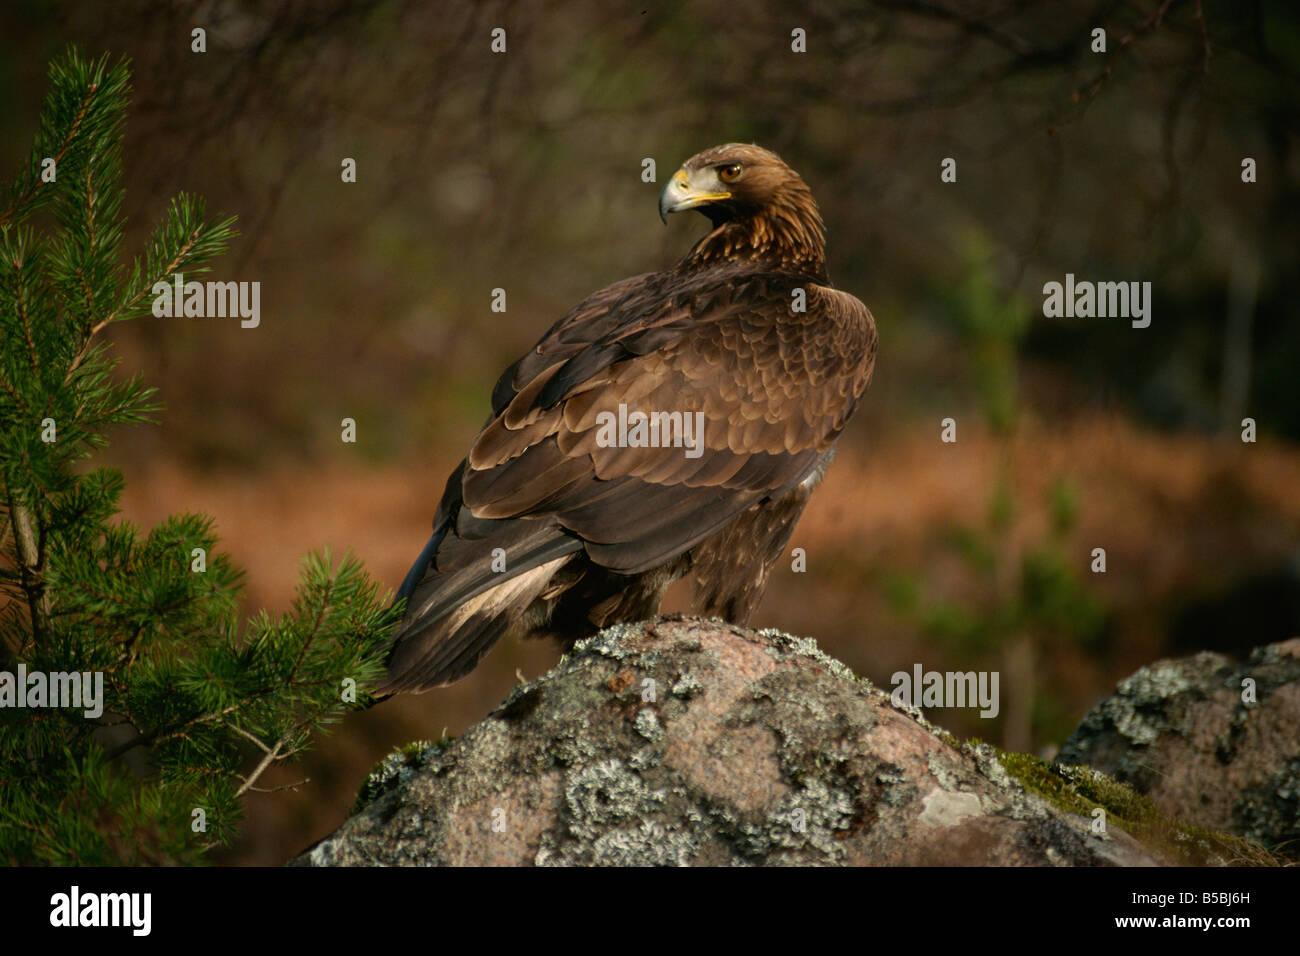 Golden eagle, Highlands, Scotland, Europe - Stock Image